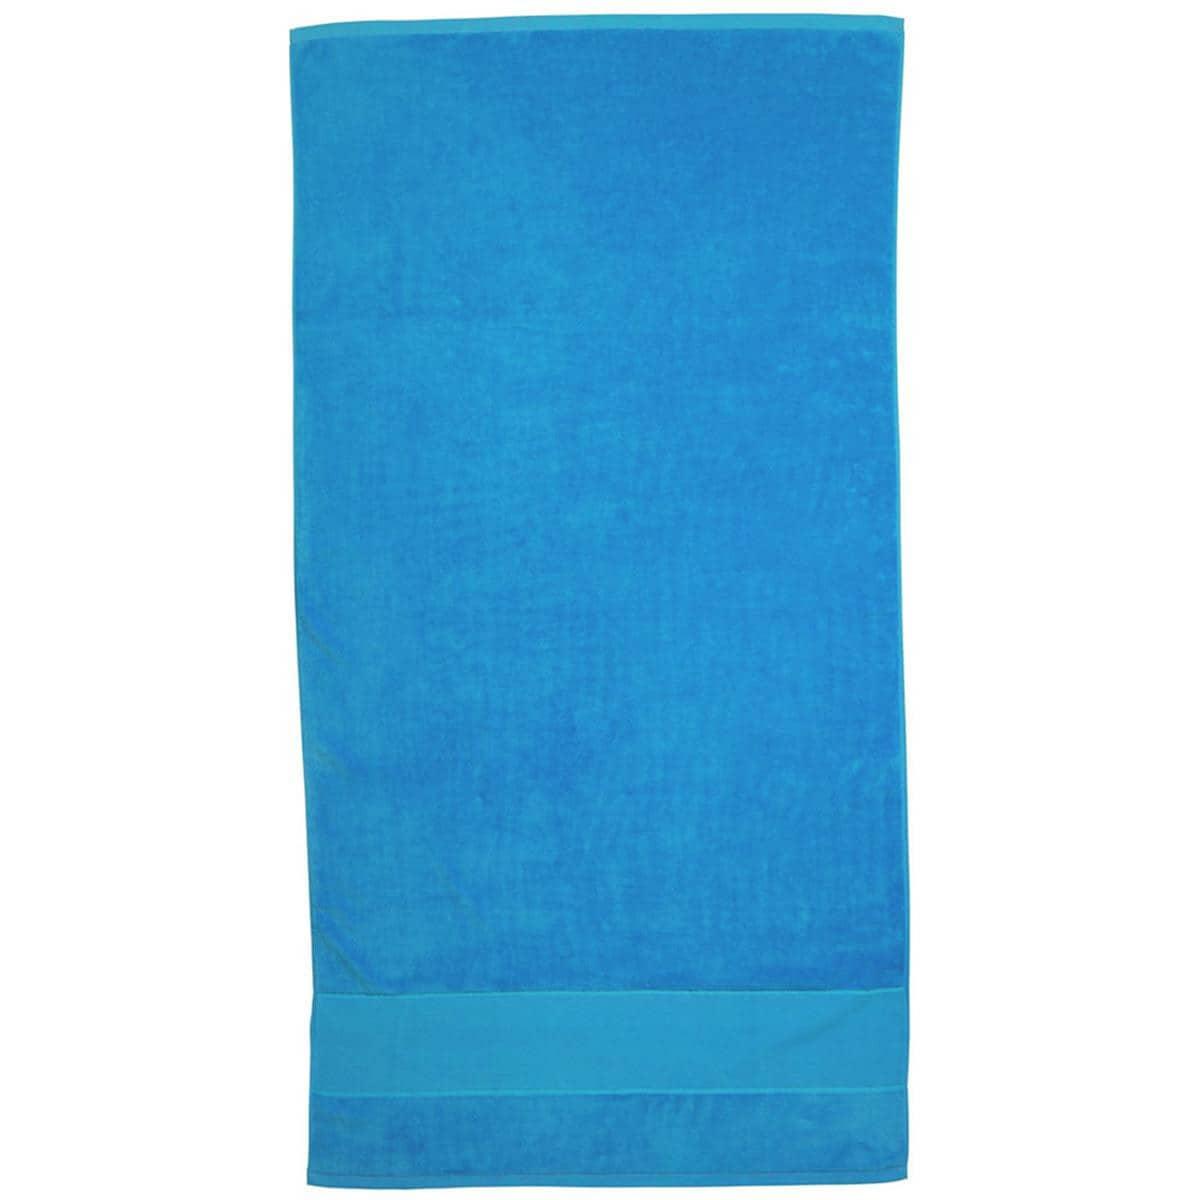 Aqua Super Soft Touch Towel Custom Printed